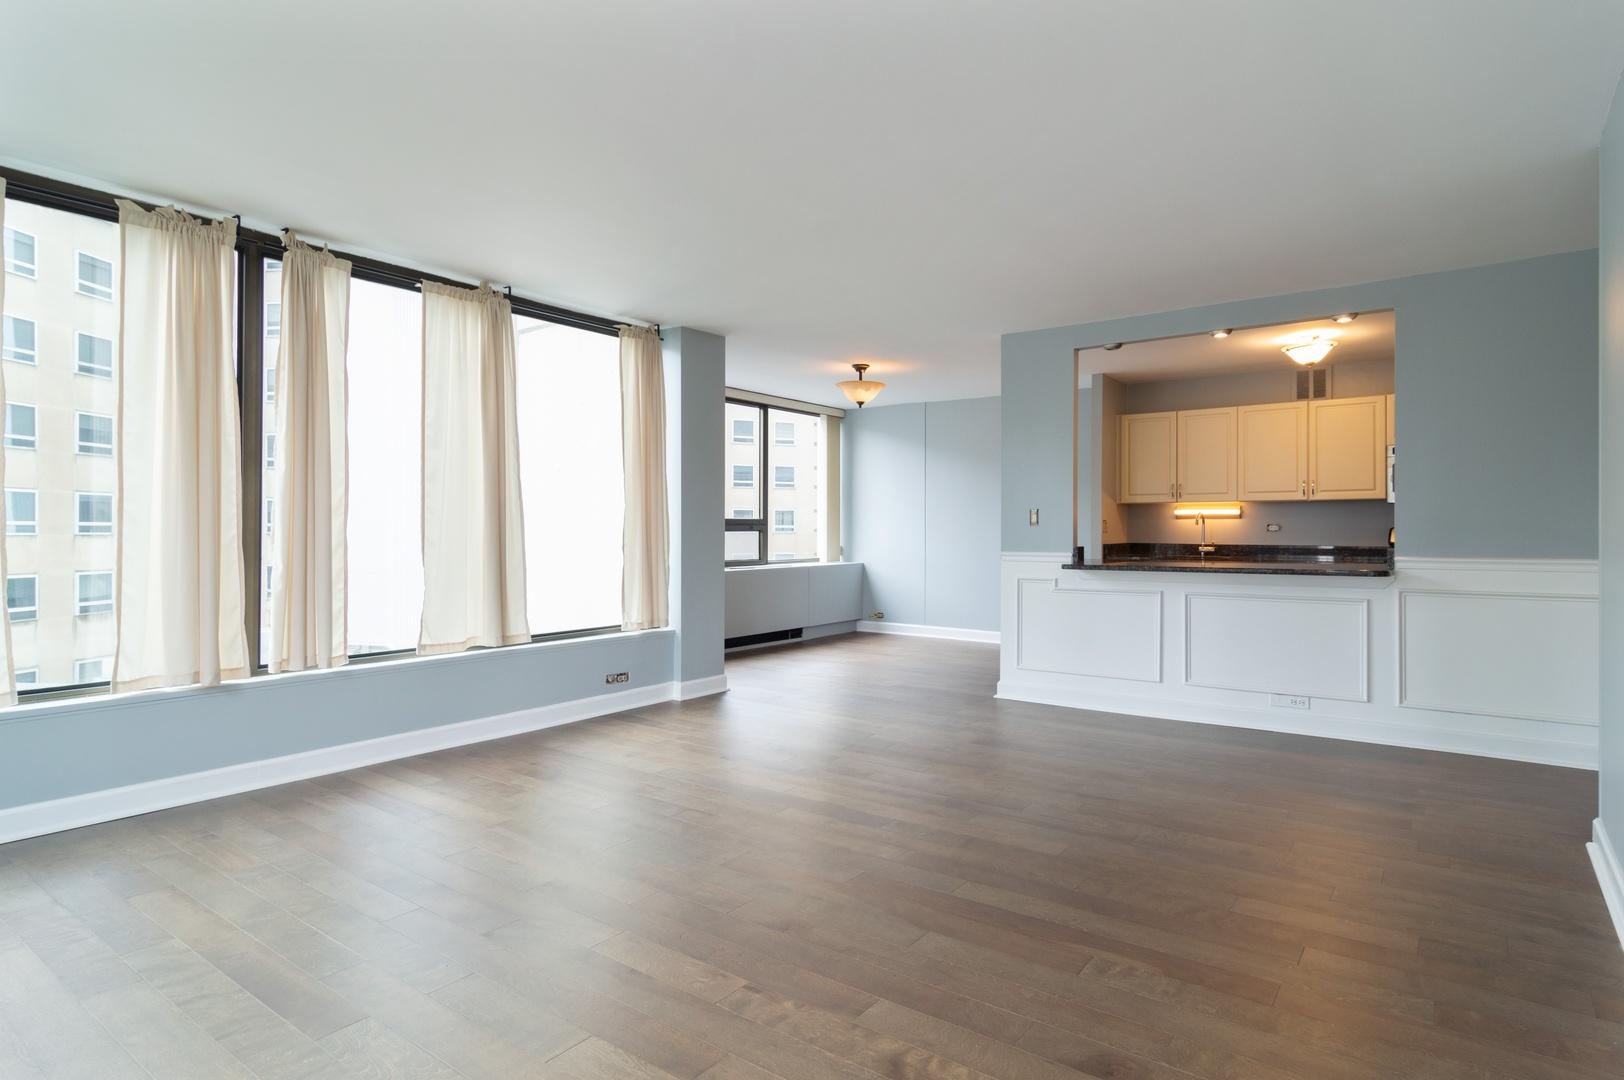 Hd 1561122884971 04 2800nlakeshoredr 817 93 livingroomdiningroom hires